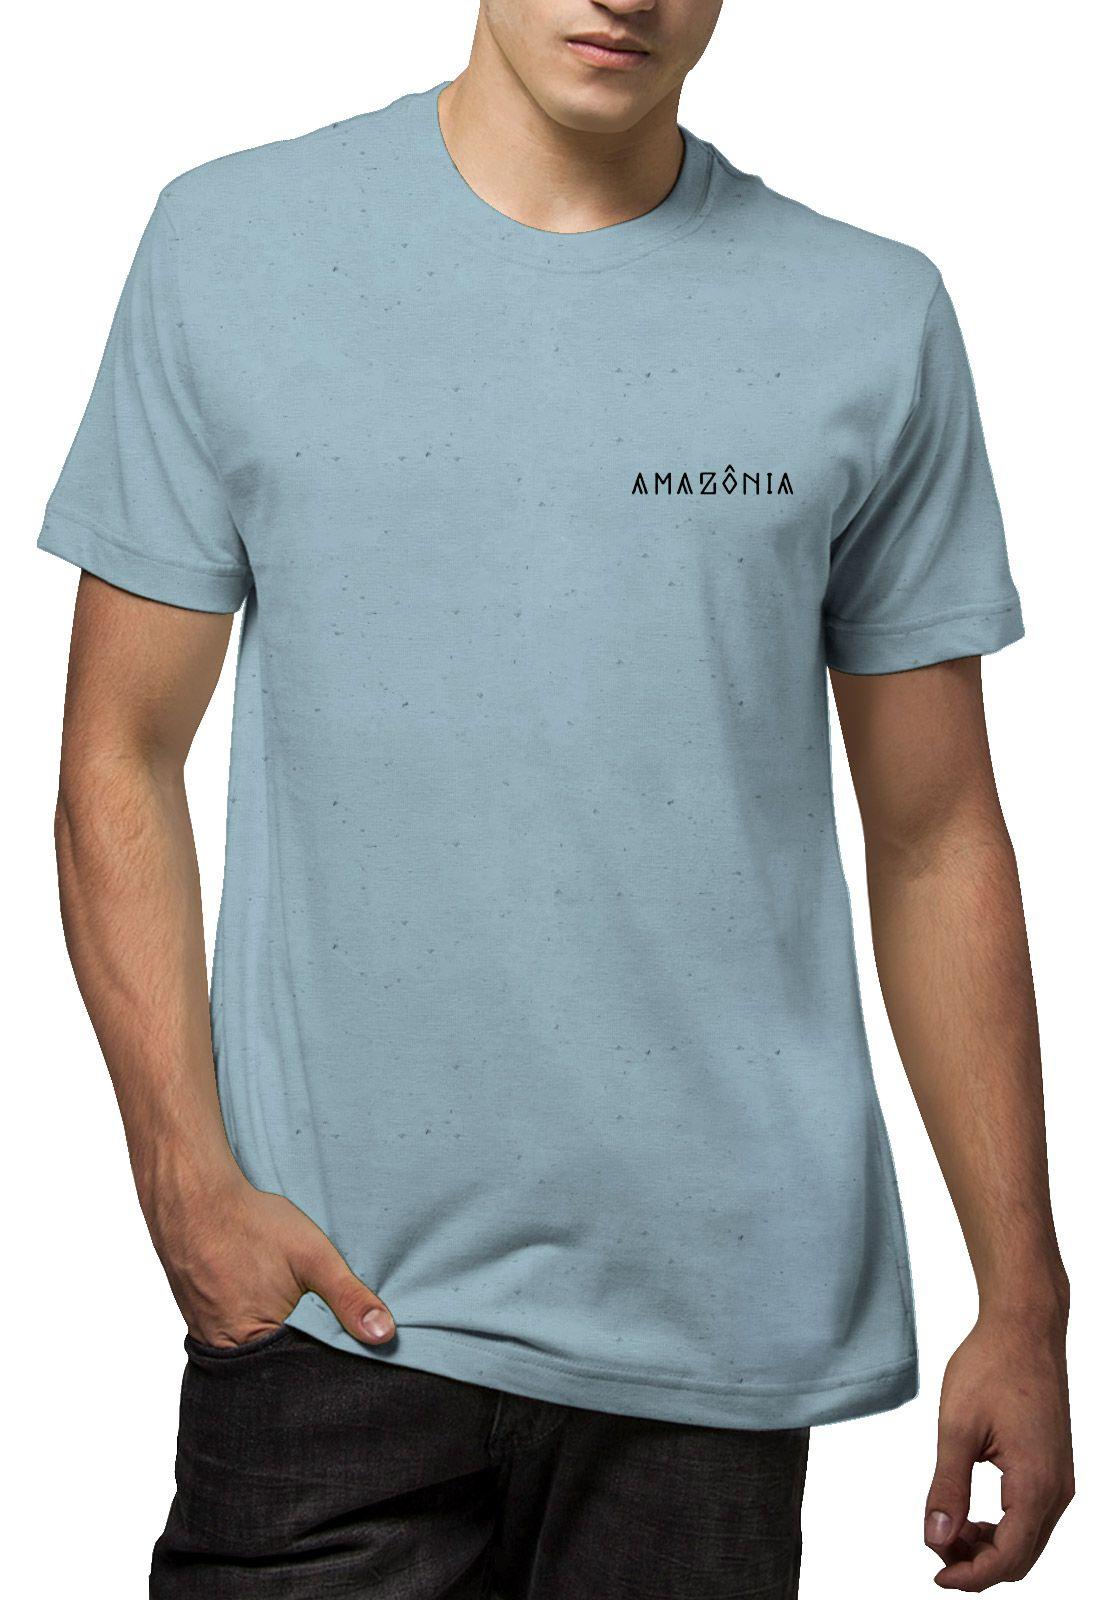 Camiseta Amazônia Linhotex Tucum - Azul